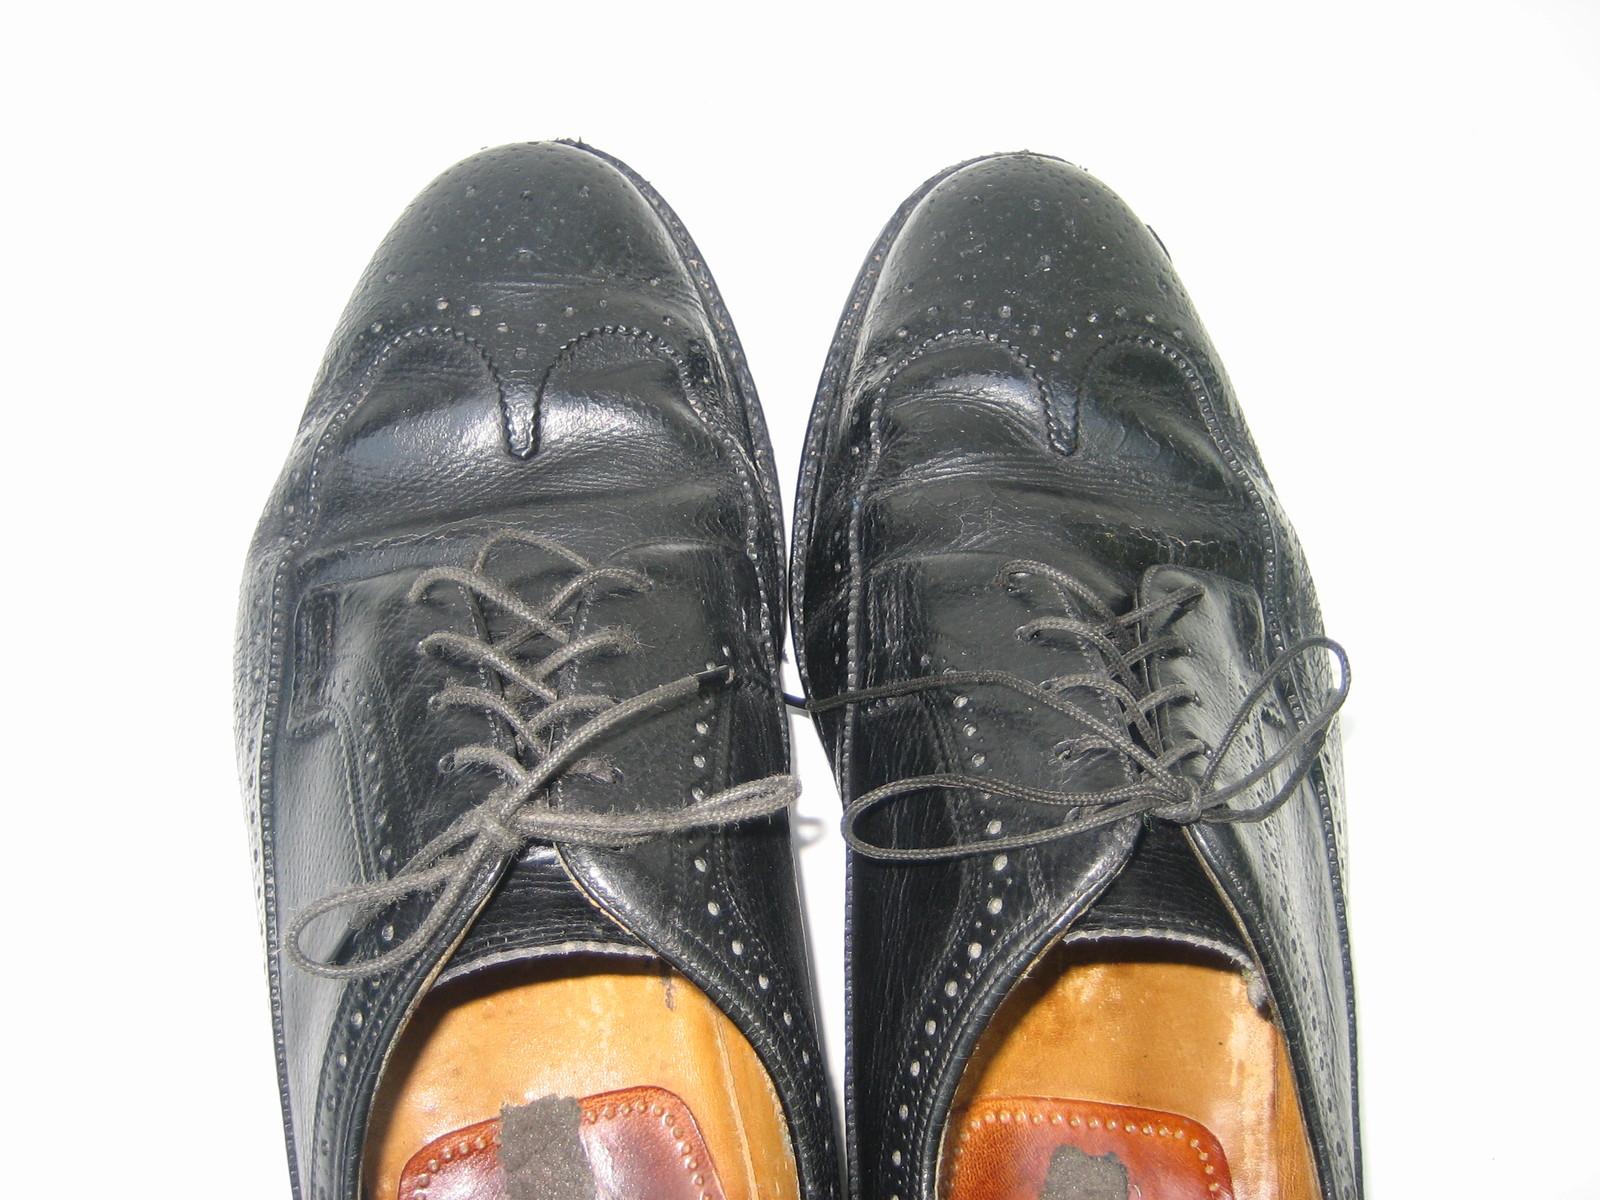 149aeb4fa8475 Germany Vintage Florsheim Imperial Black and 20 similar items